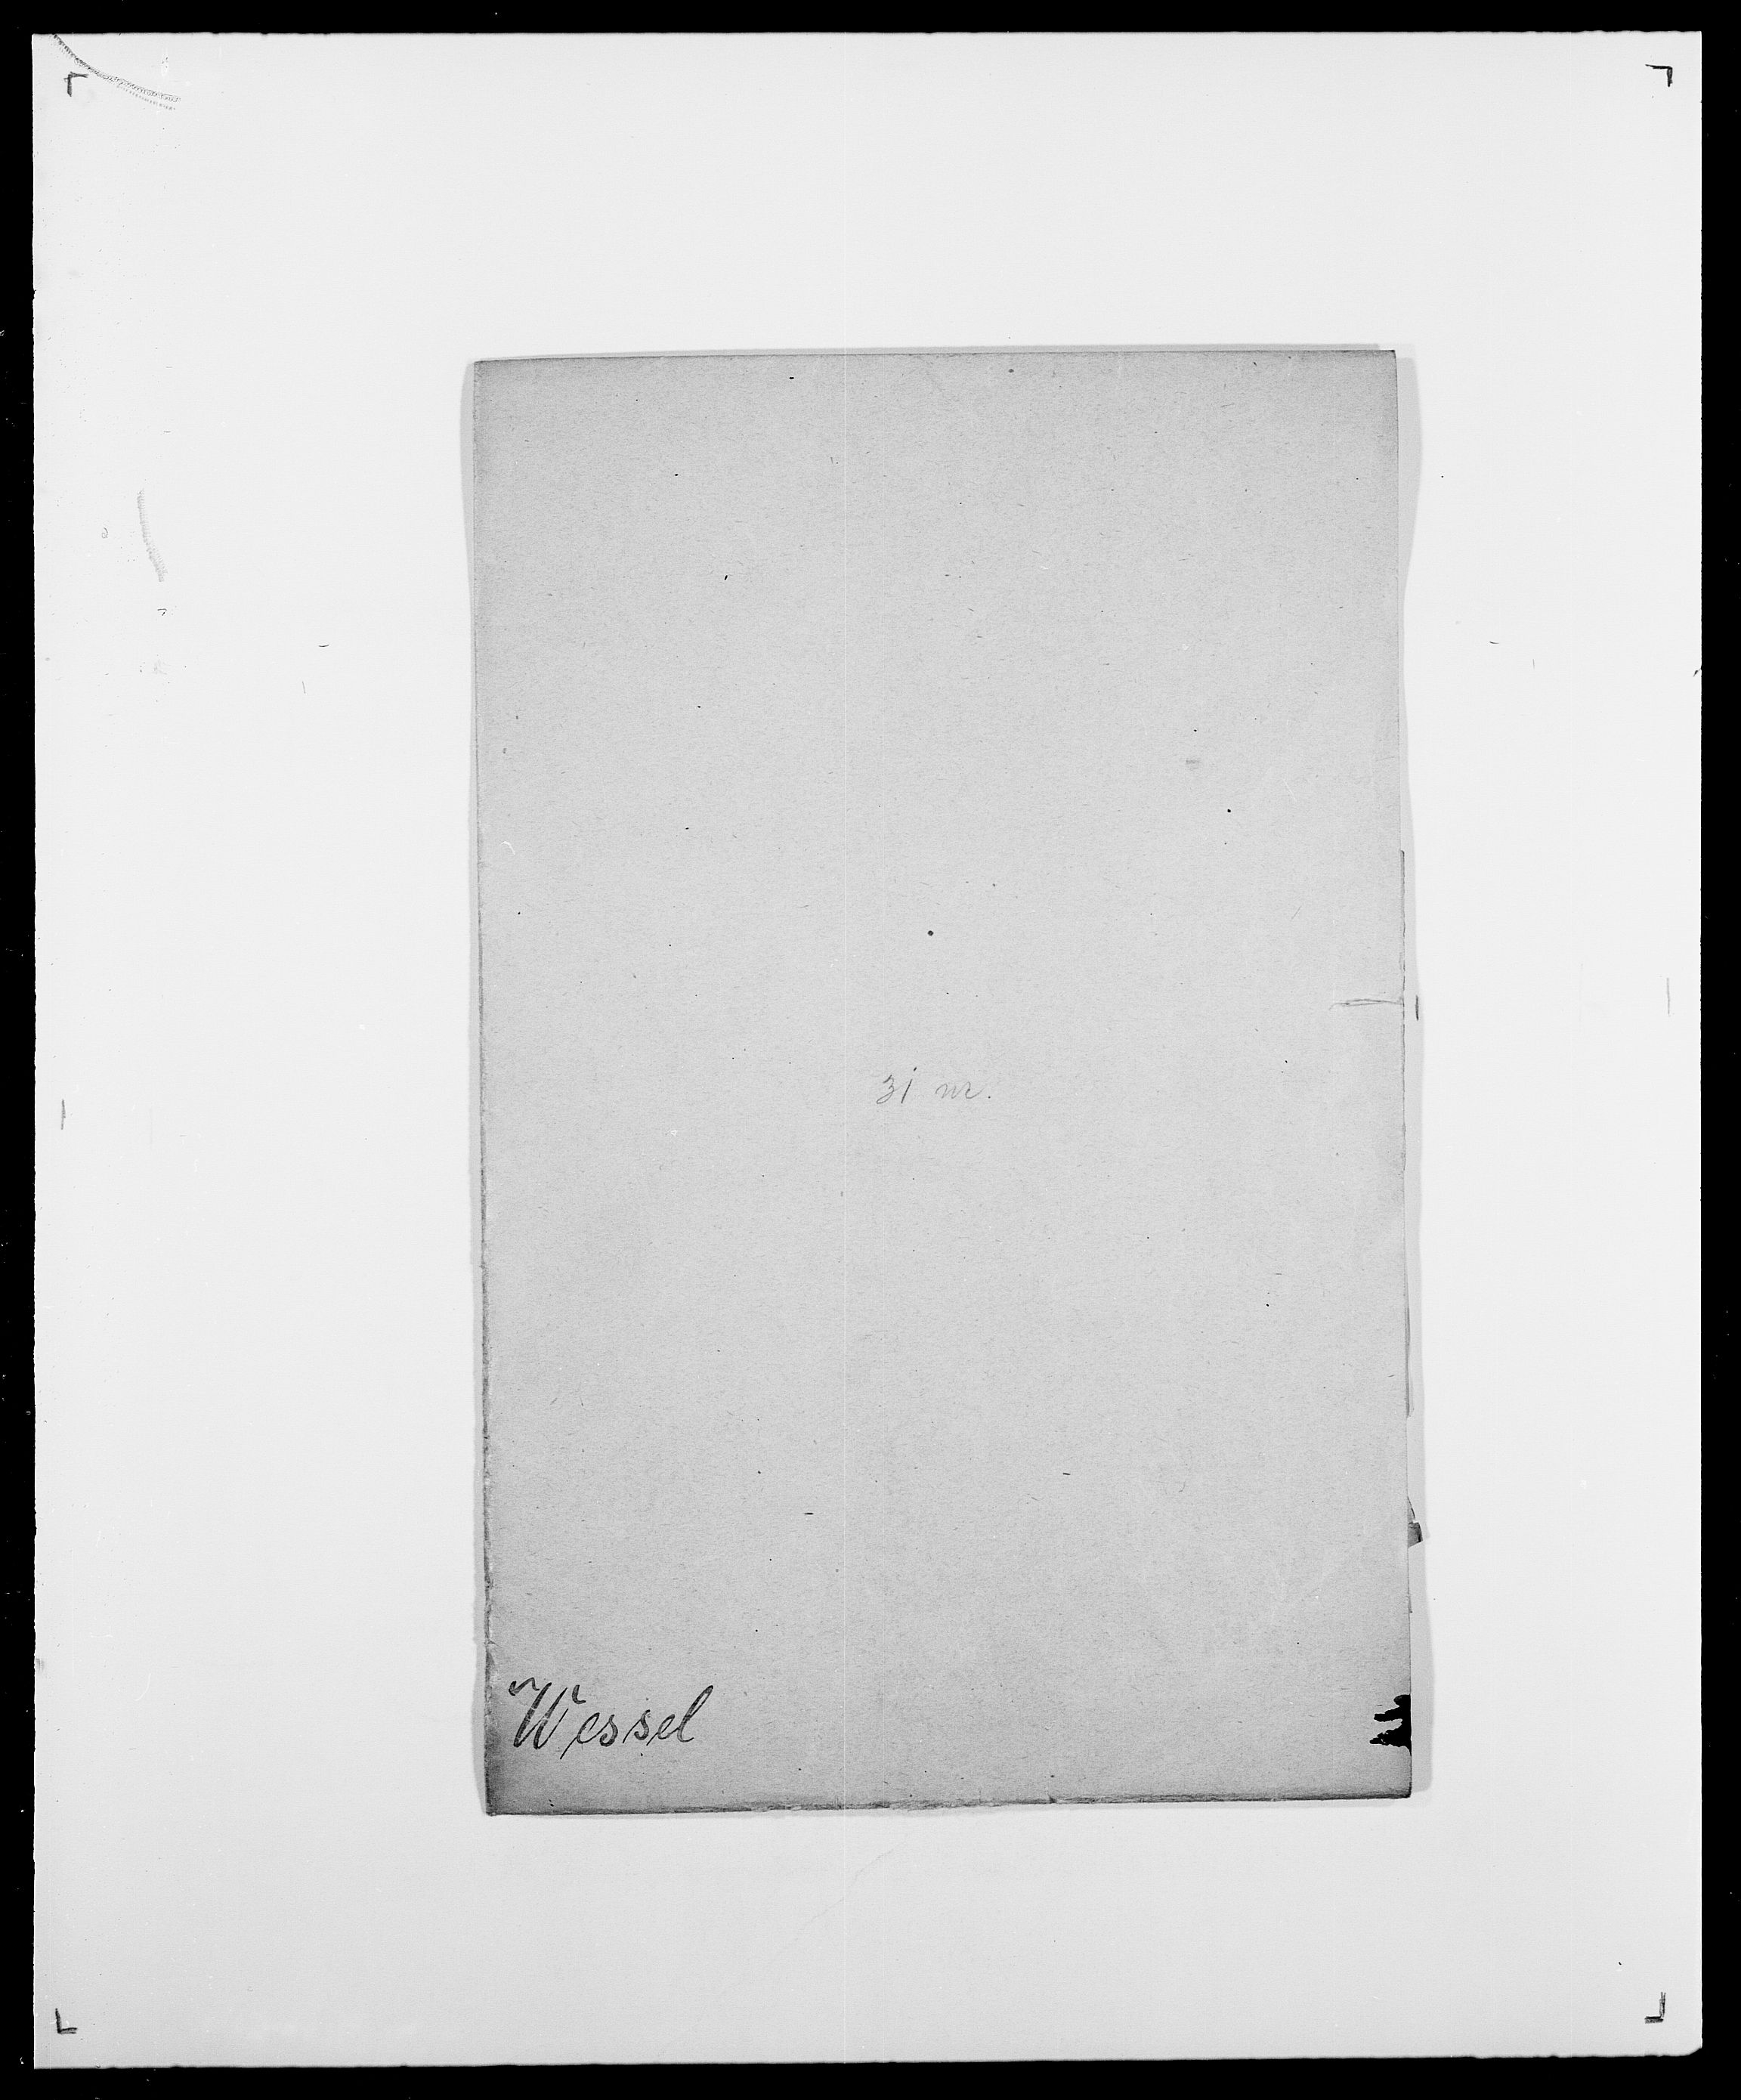 SAO, Delgobe, Charles Antoine - samling, D/Da/L0041: Vemmestad - Viker, s. 187